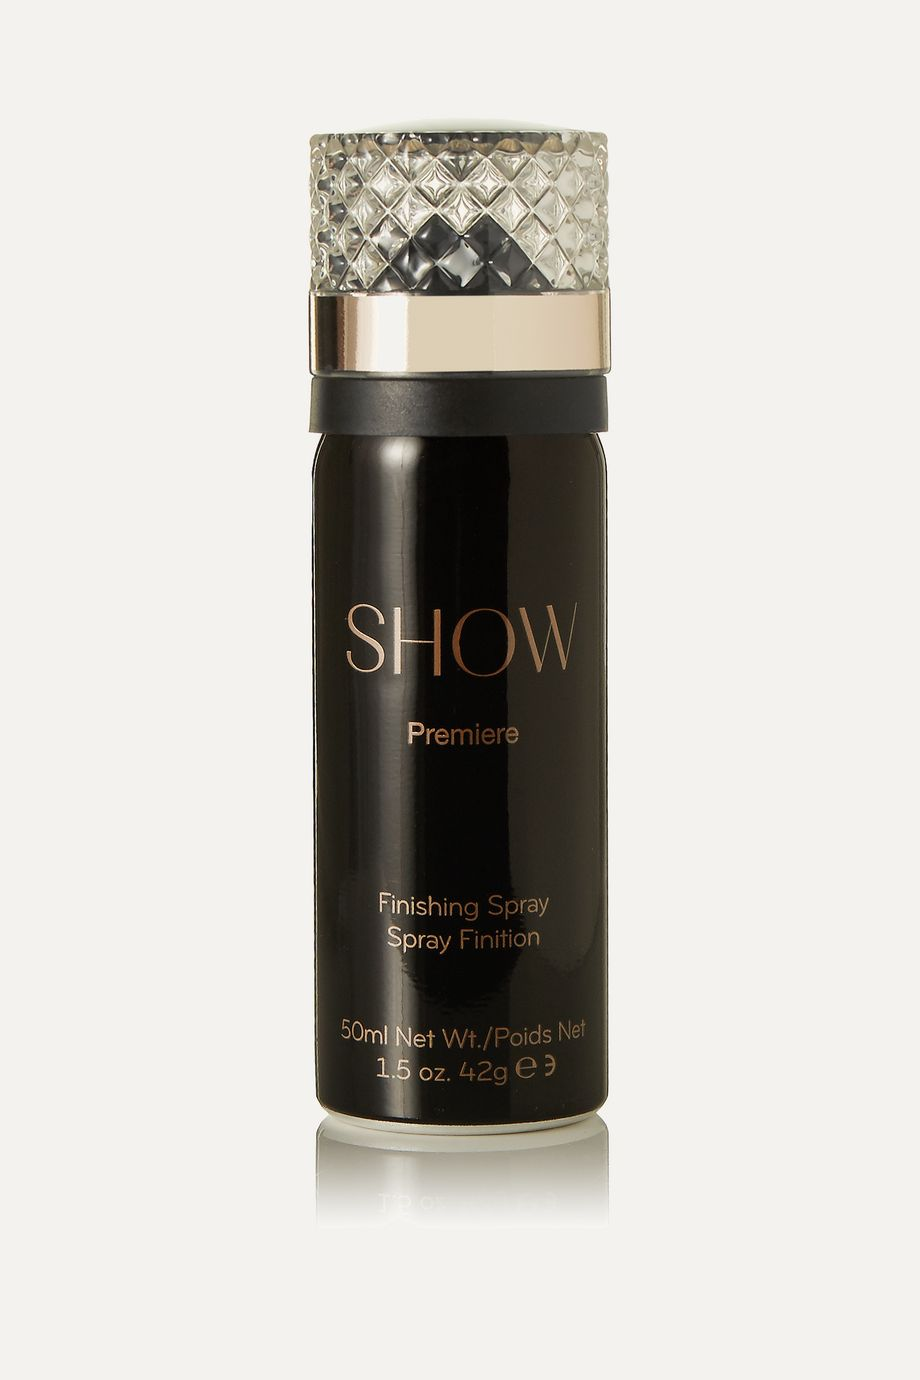 SHOW Beauty Premiere Finishing Spray, 50ml